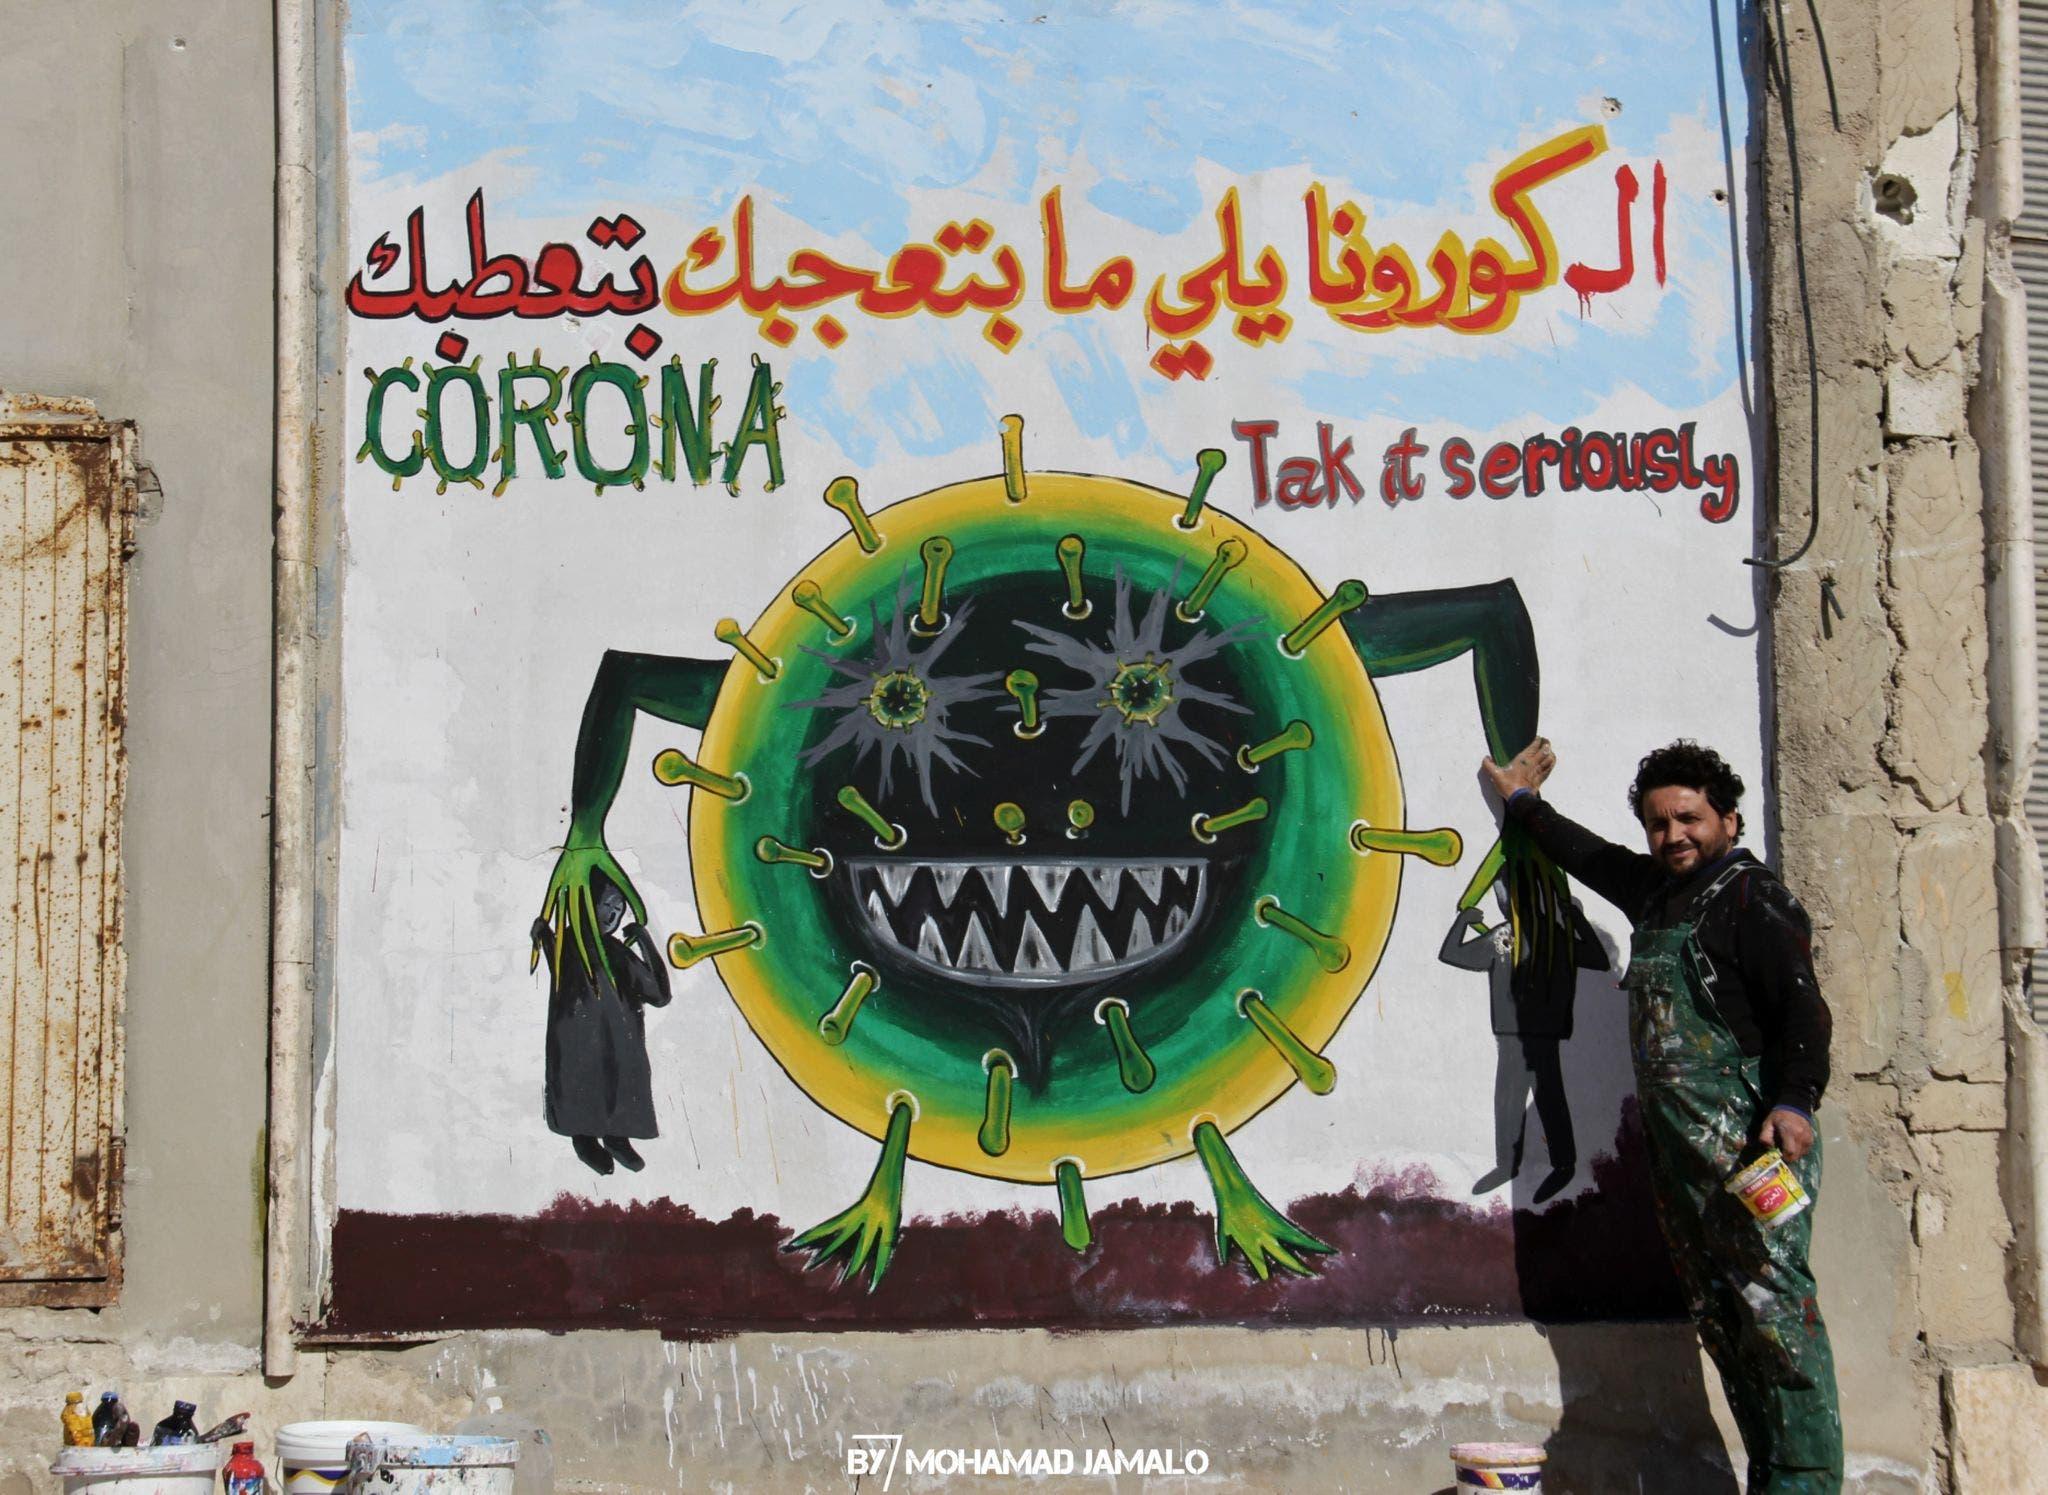 Syrian artist Aziz Asmar with a coronavirus mural in Idlib. (Mohamad Jamalo)